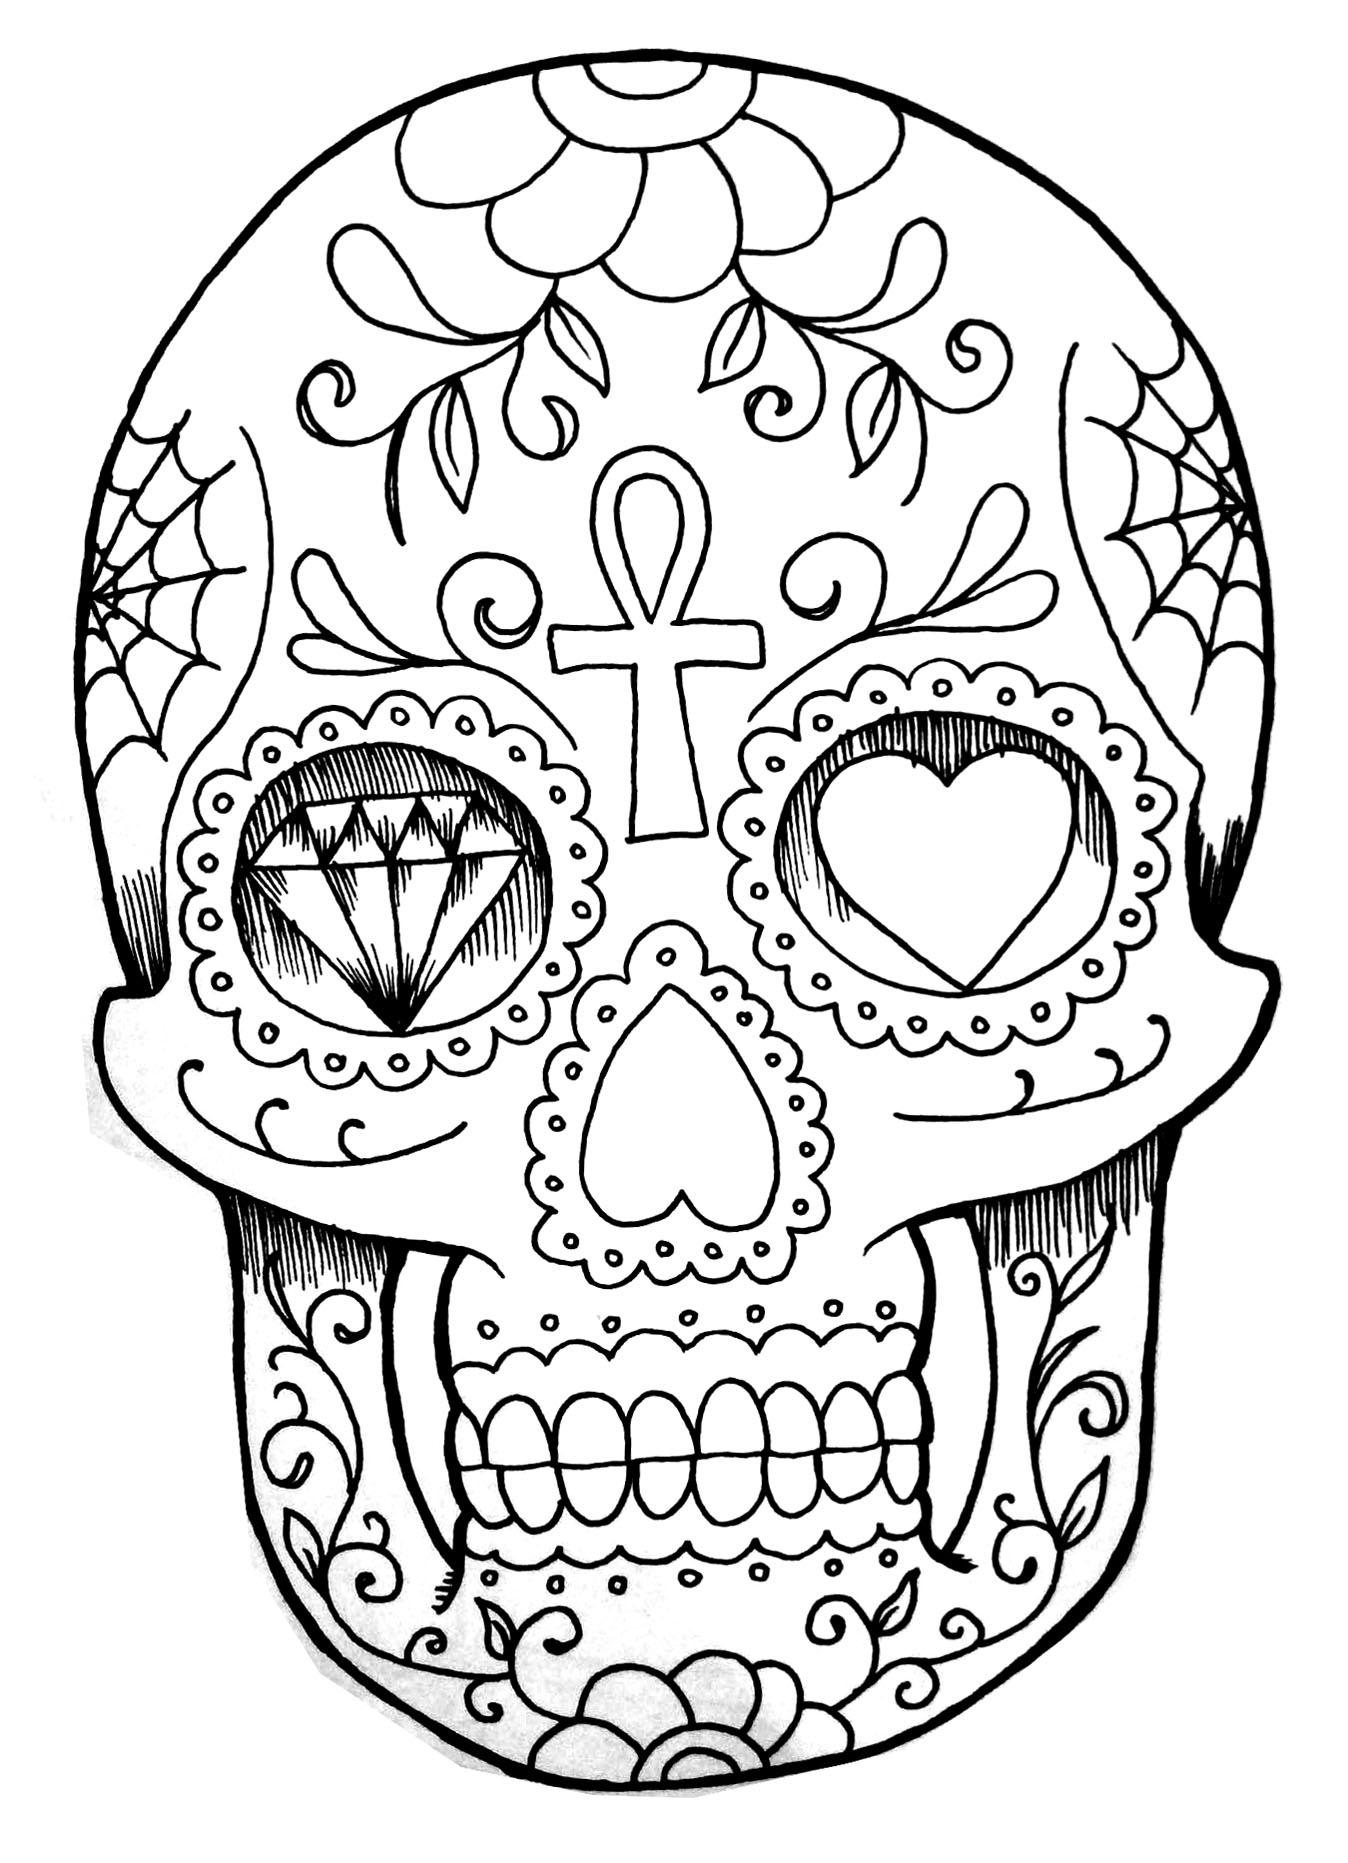 Colorear para adultos : Tatuajes - 1